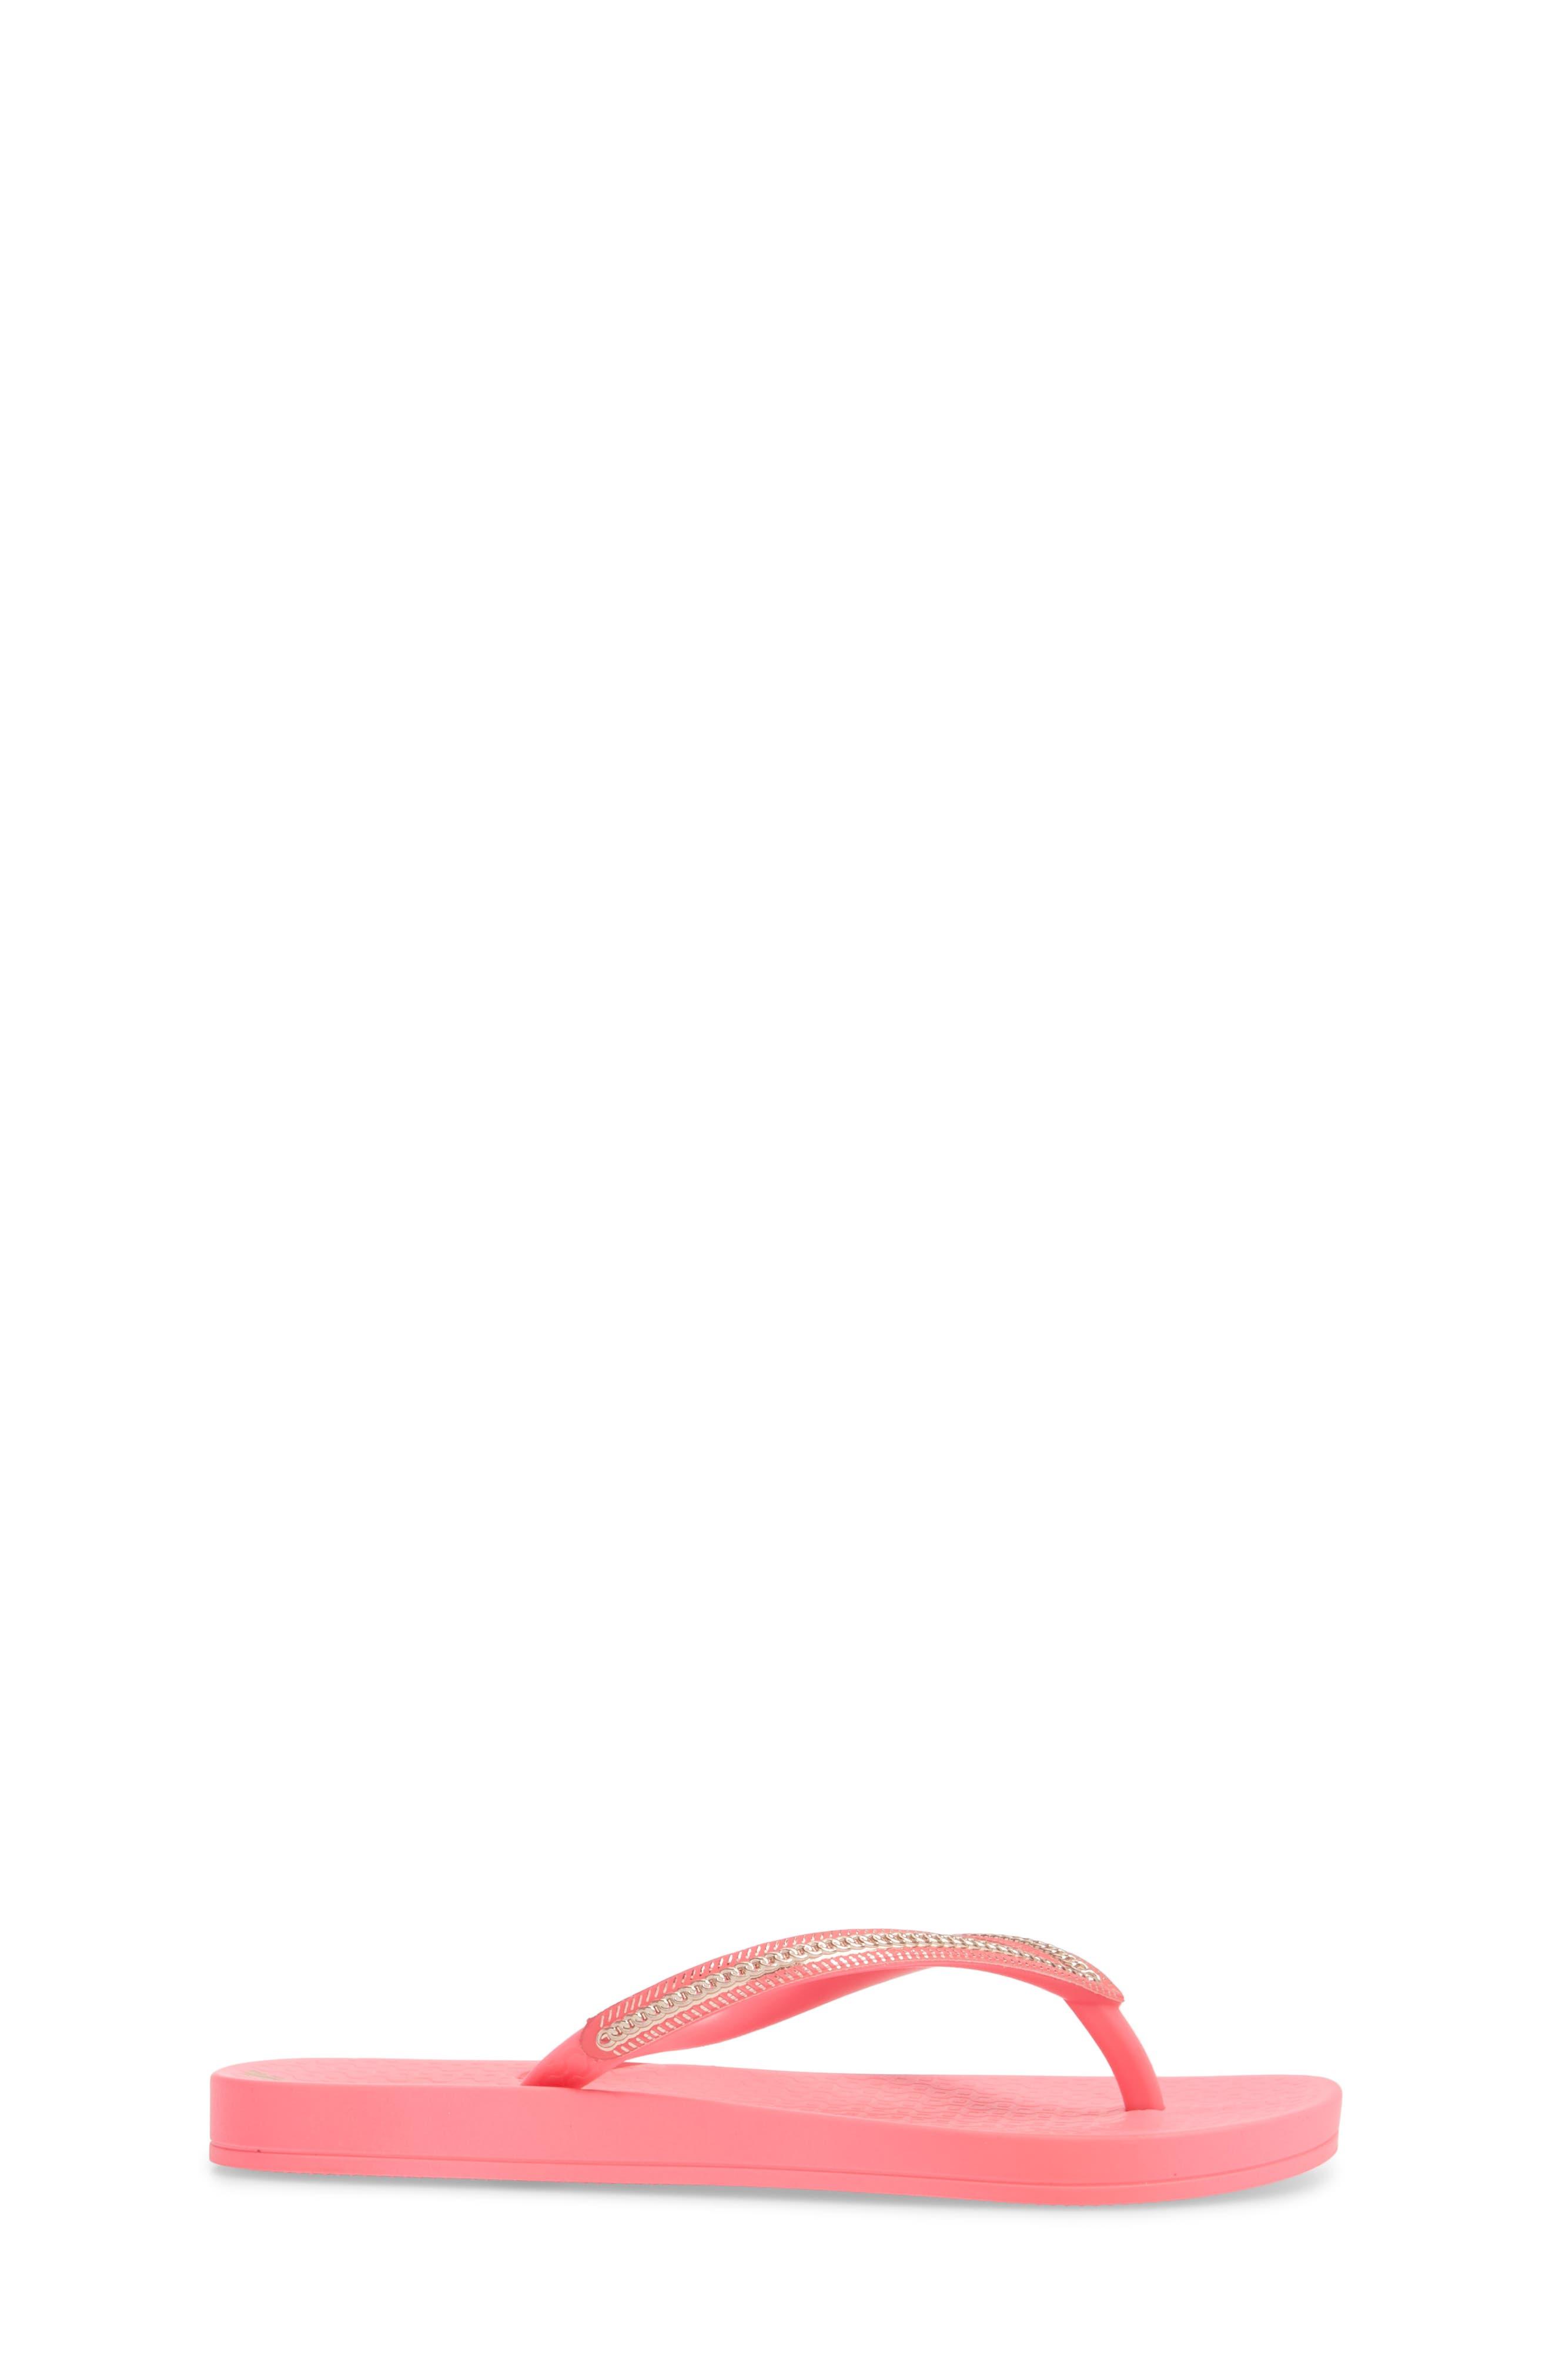 Ana Metallic Flip Flop,                             Alternate thumbnail 3, color,                             Pink Neon/ Rose